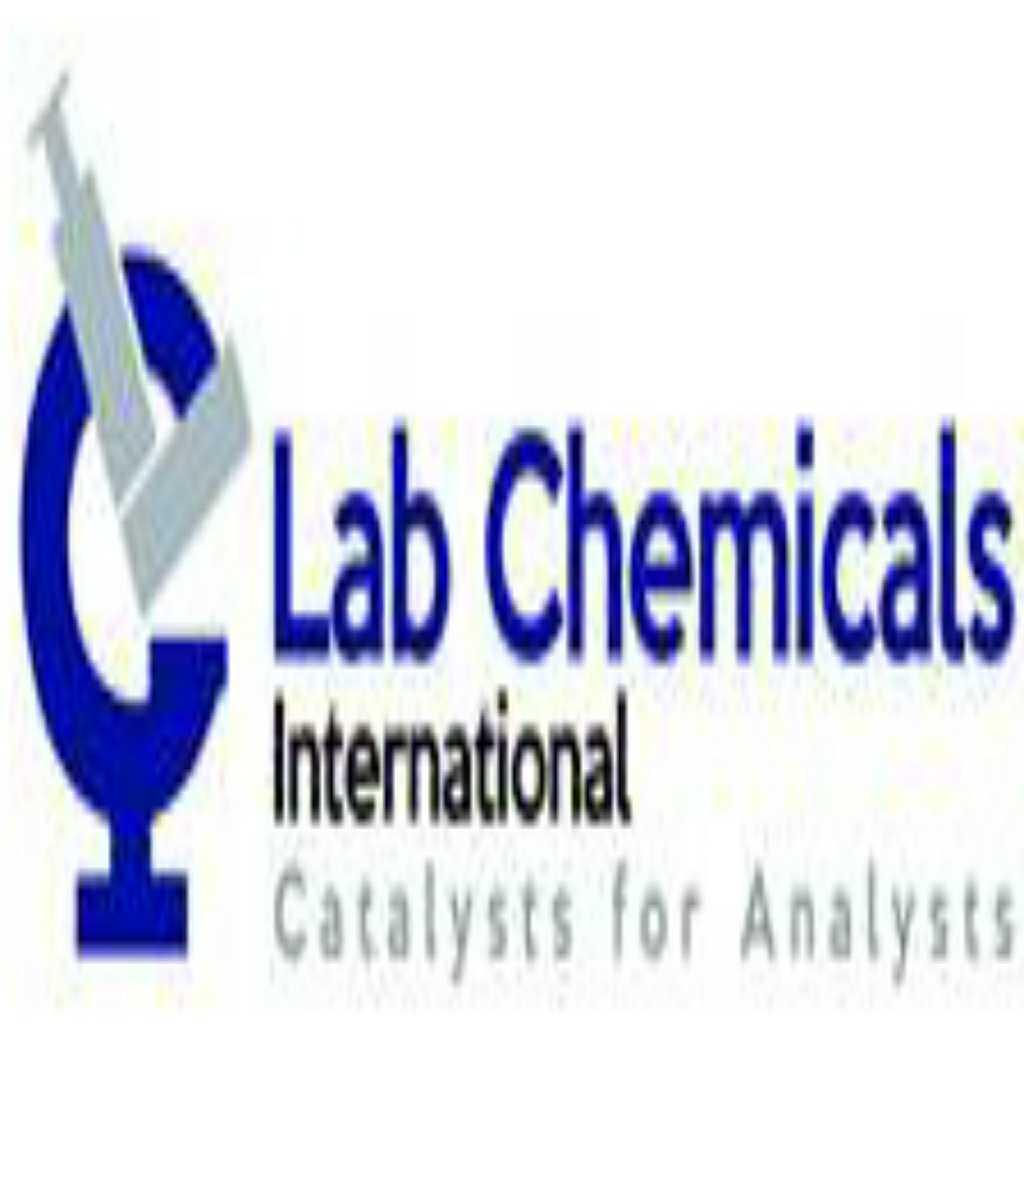 LAB CHEMICALS INTERNATIONAL LTD.